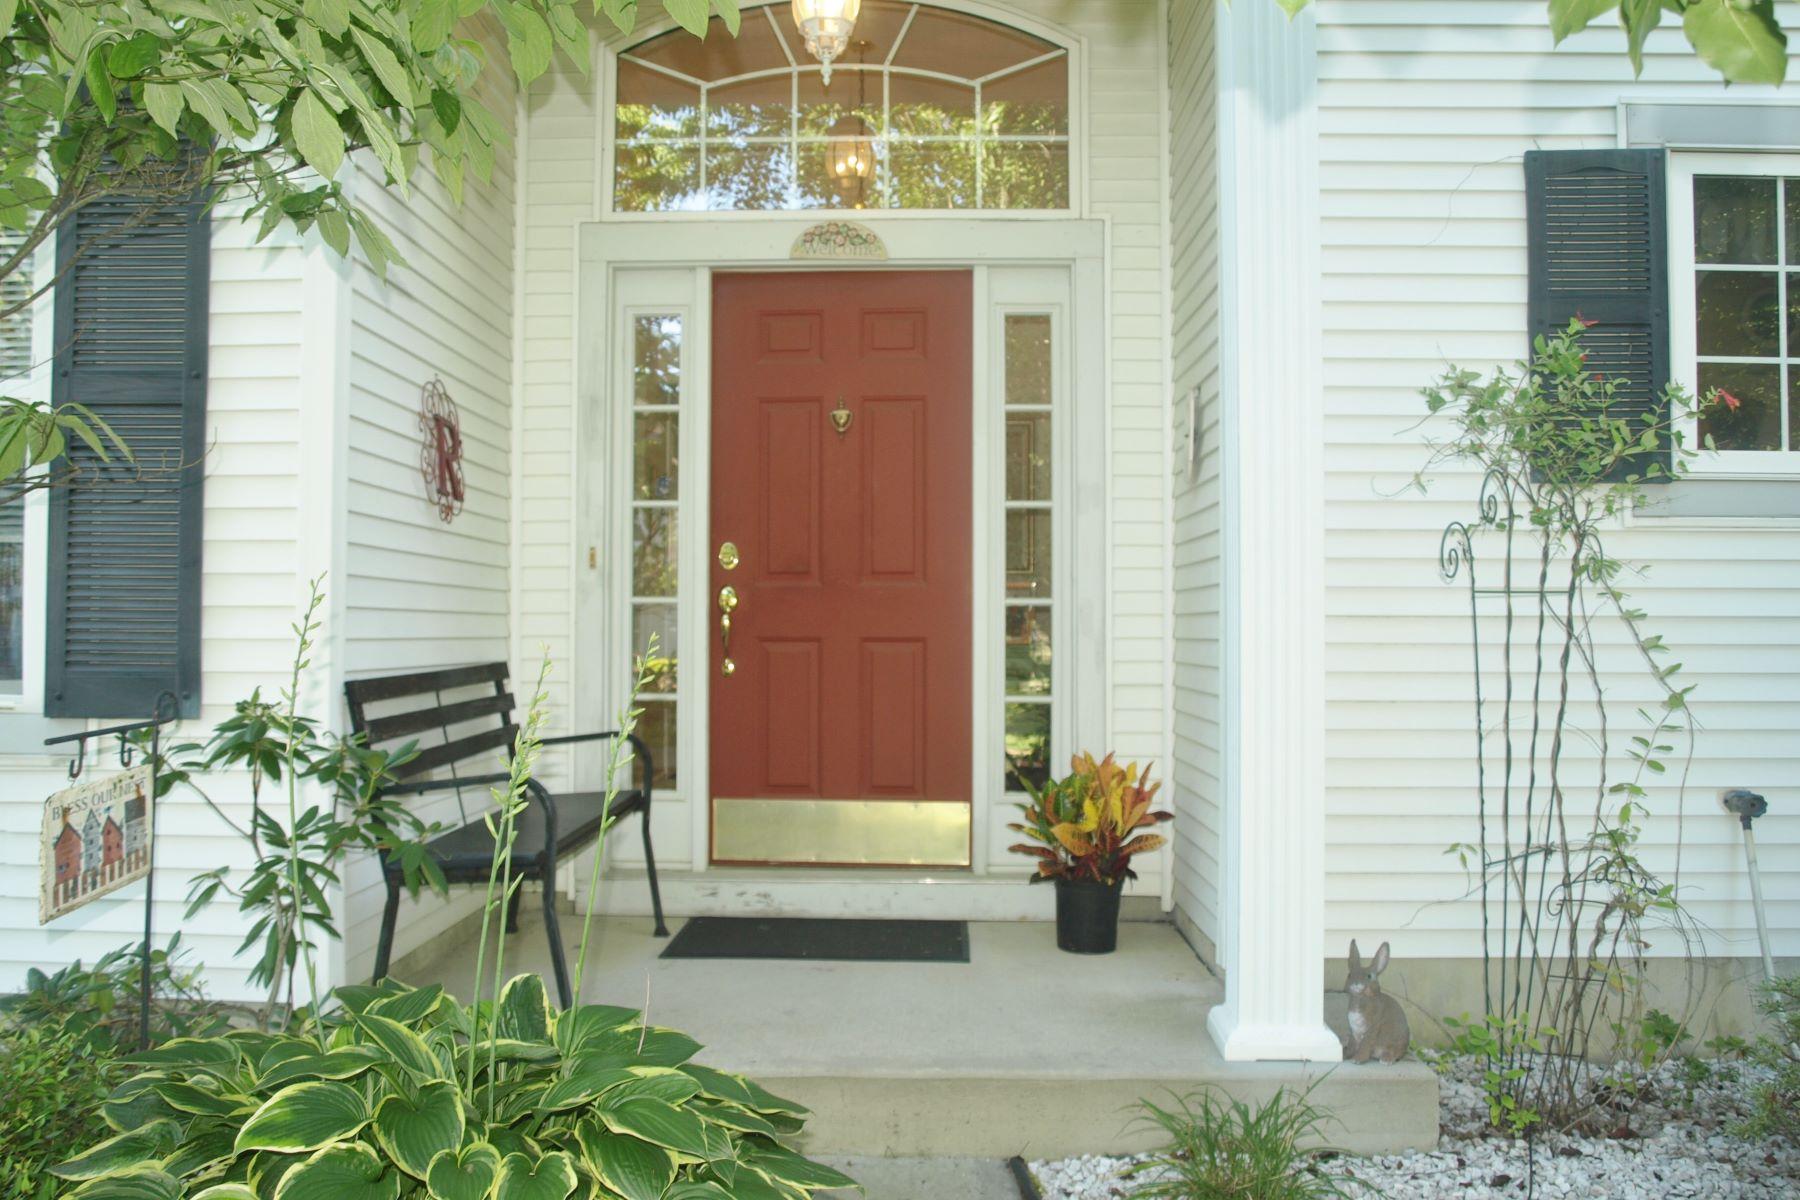 独户住宅 为 销售 在 New Jersey's Premier Active Adult Communities 14 Courtney Lane 曼彻斯特, 新泽西州 08759 美国